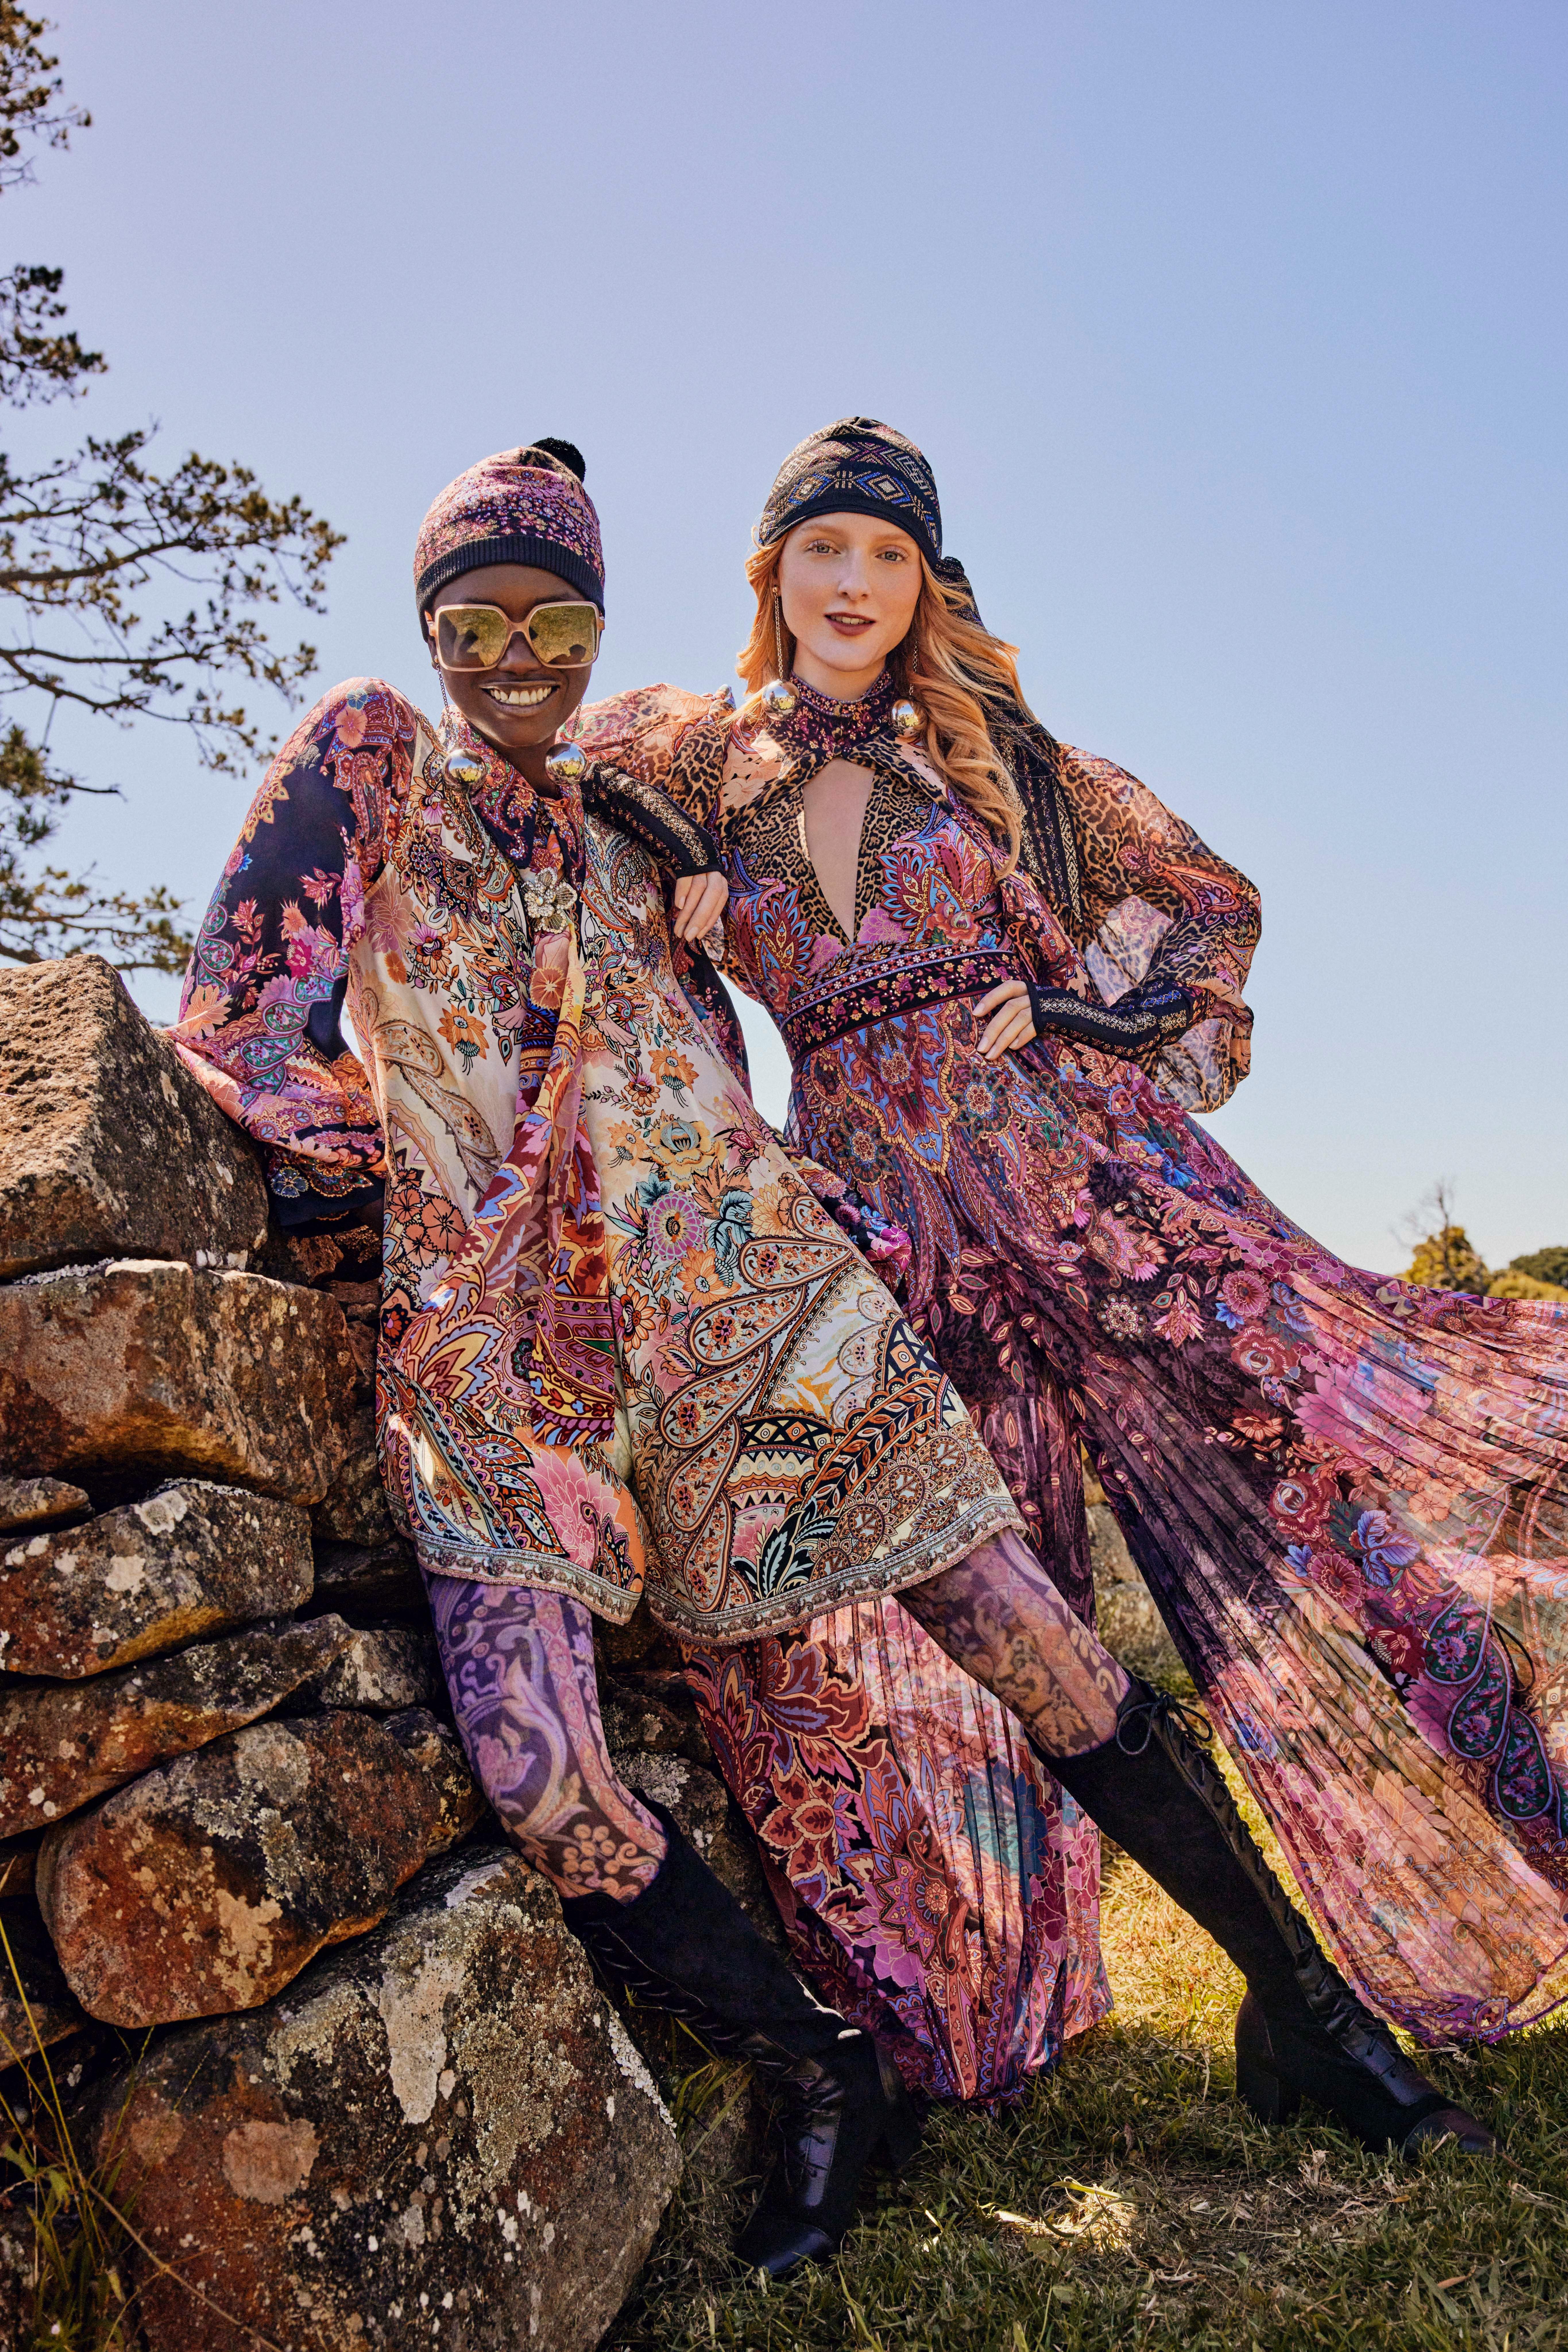 Madison Stubbington and Agi Akur for Camilla | Pride Models news